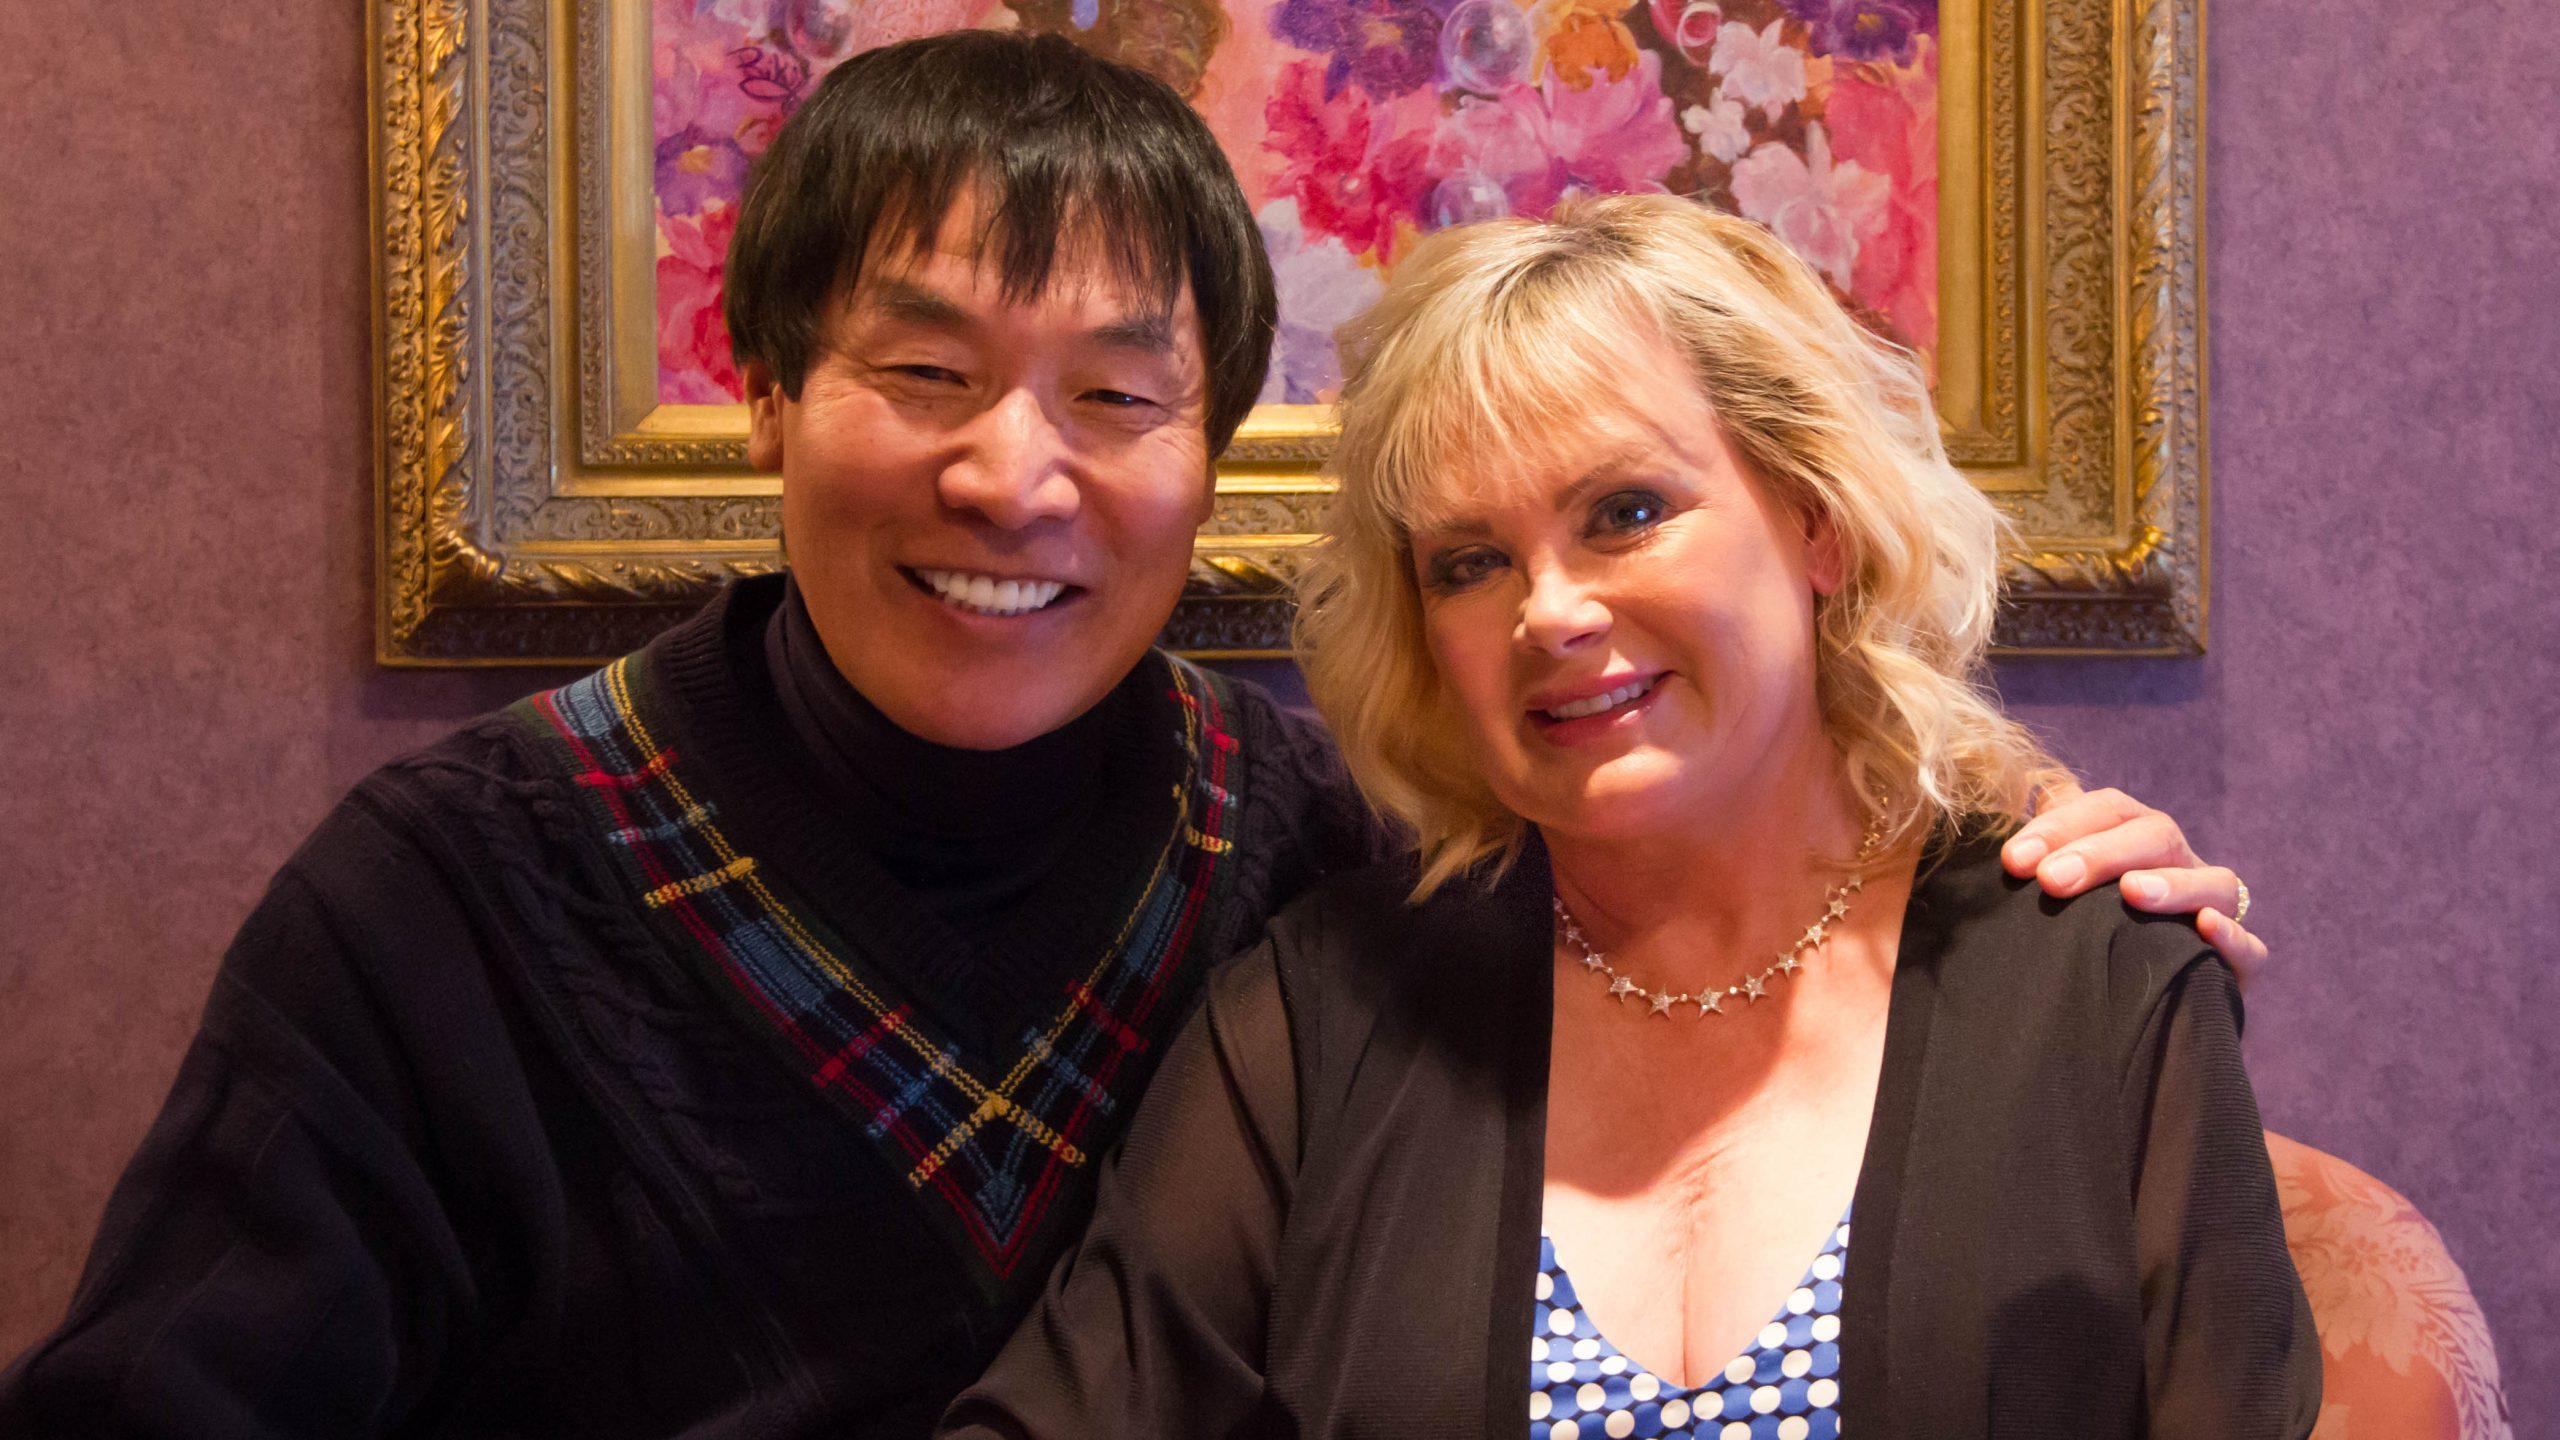 130326 Dorothy Shoji Tabuchi during interview scaled - National Fiddler Hall of Fame selects Branson's incredible Shoji Tabuchi!